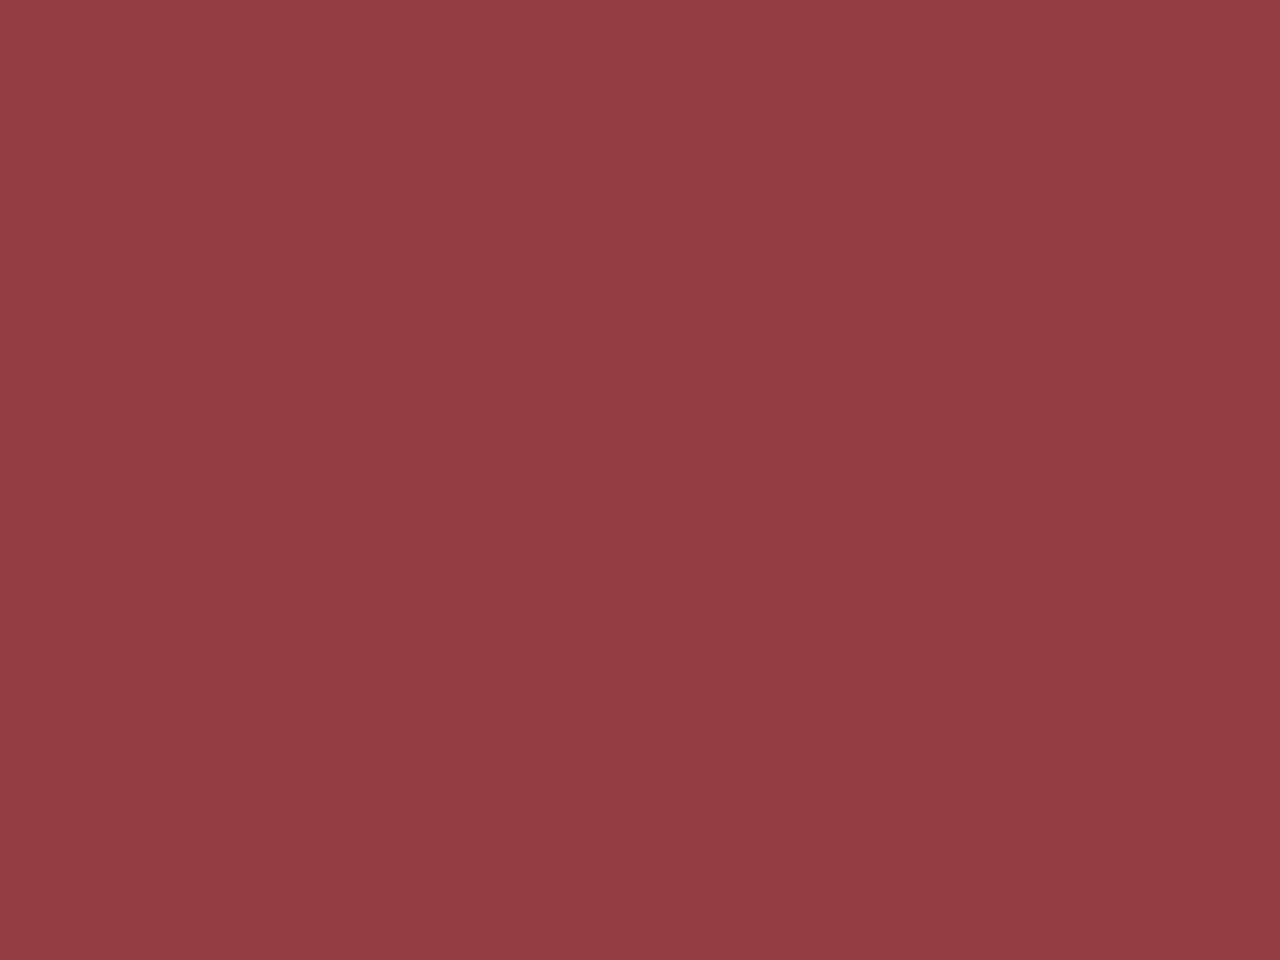 1280x960 Smokey Topaz Solid Color Background